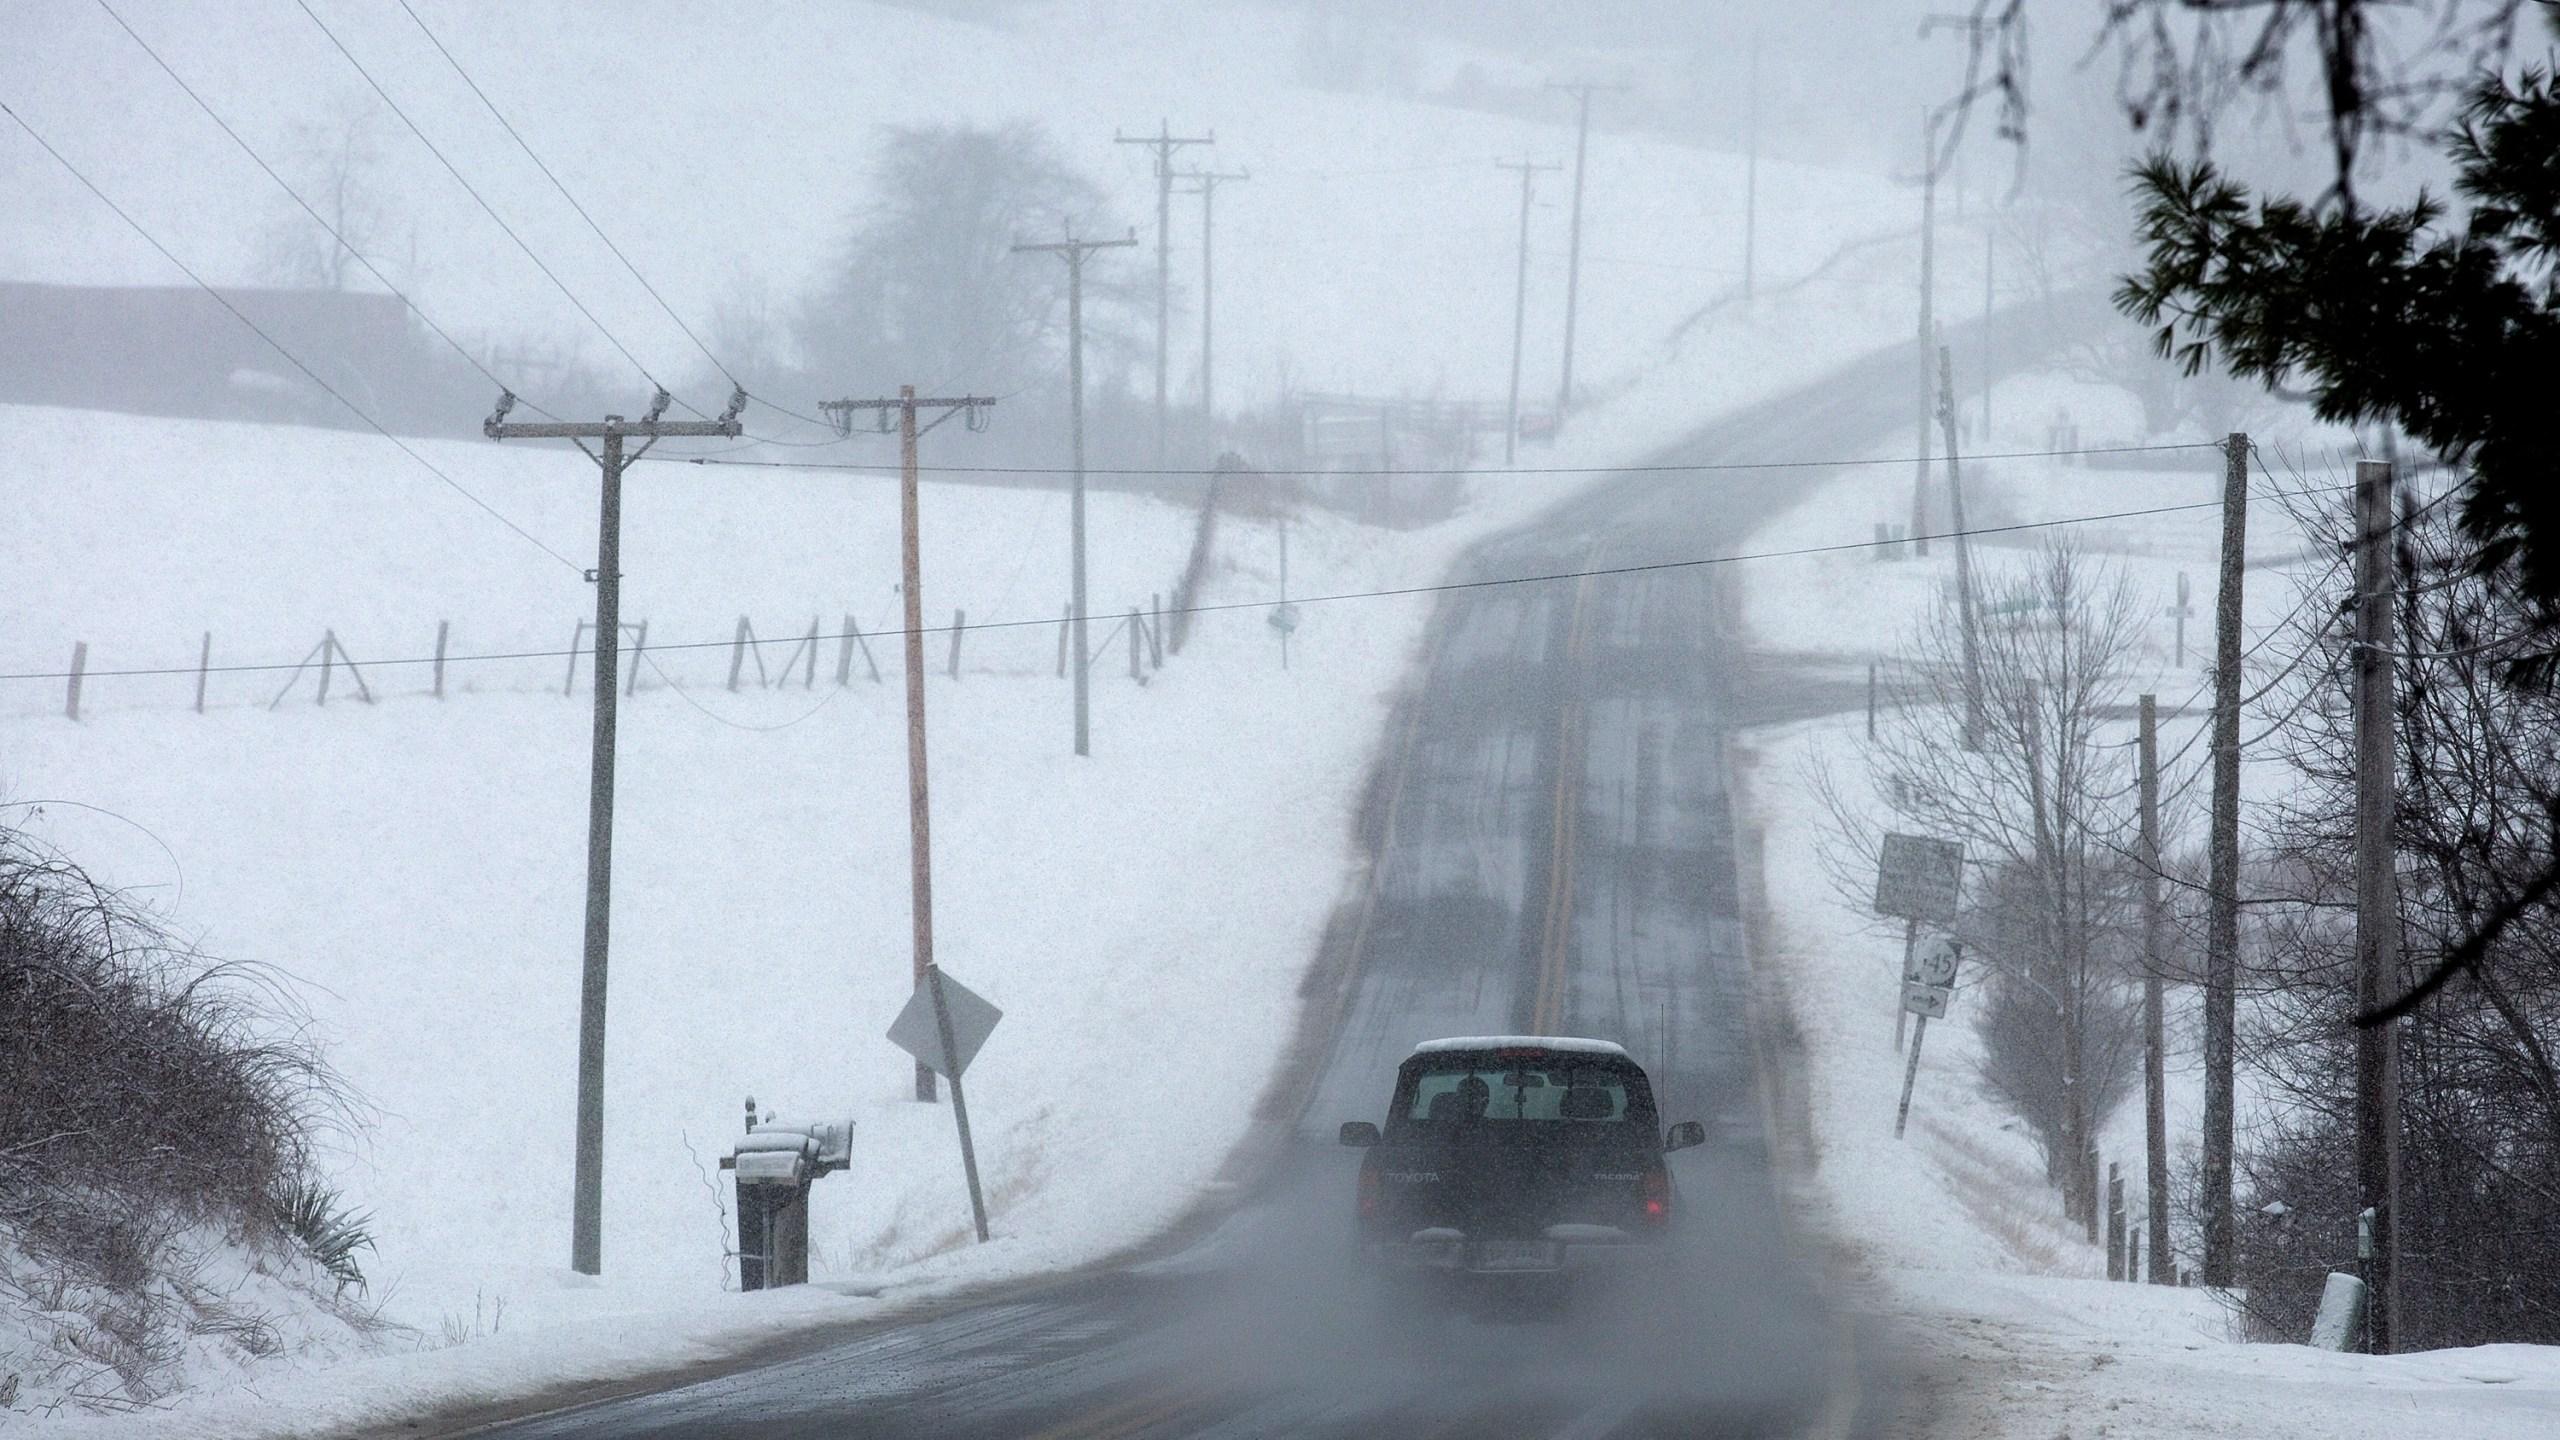 Winter_Weather_Virginia_55742-159532.jpg80618276